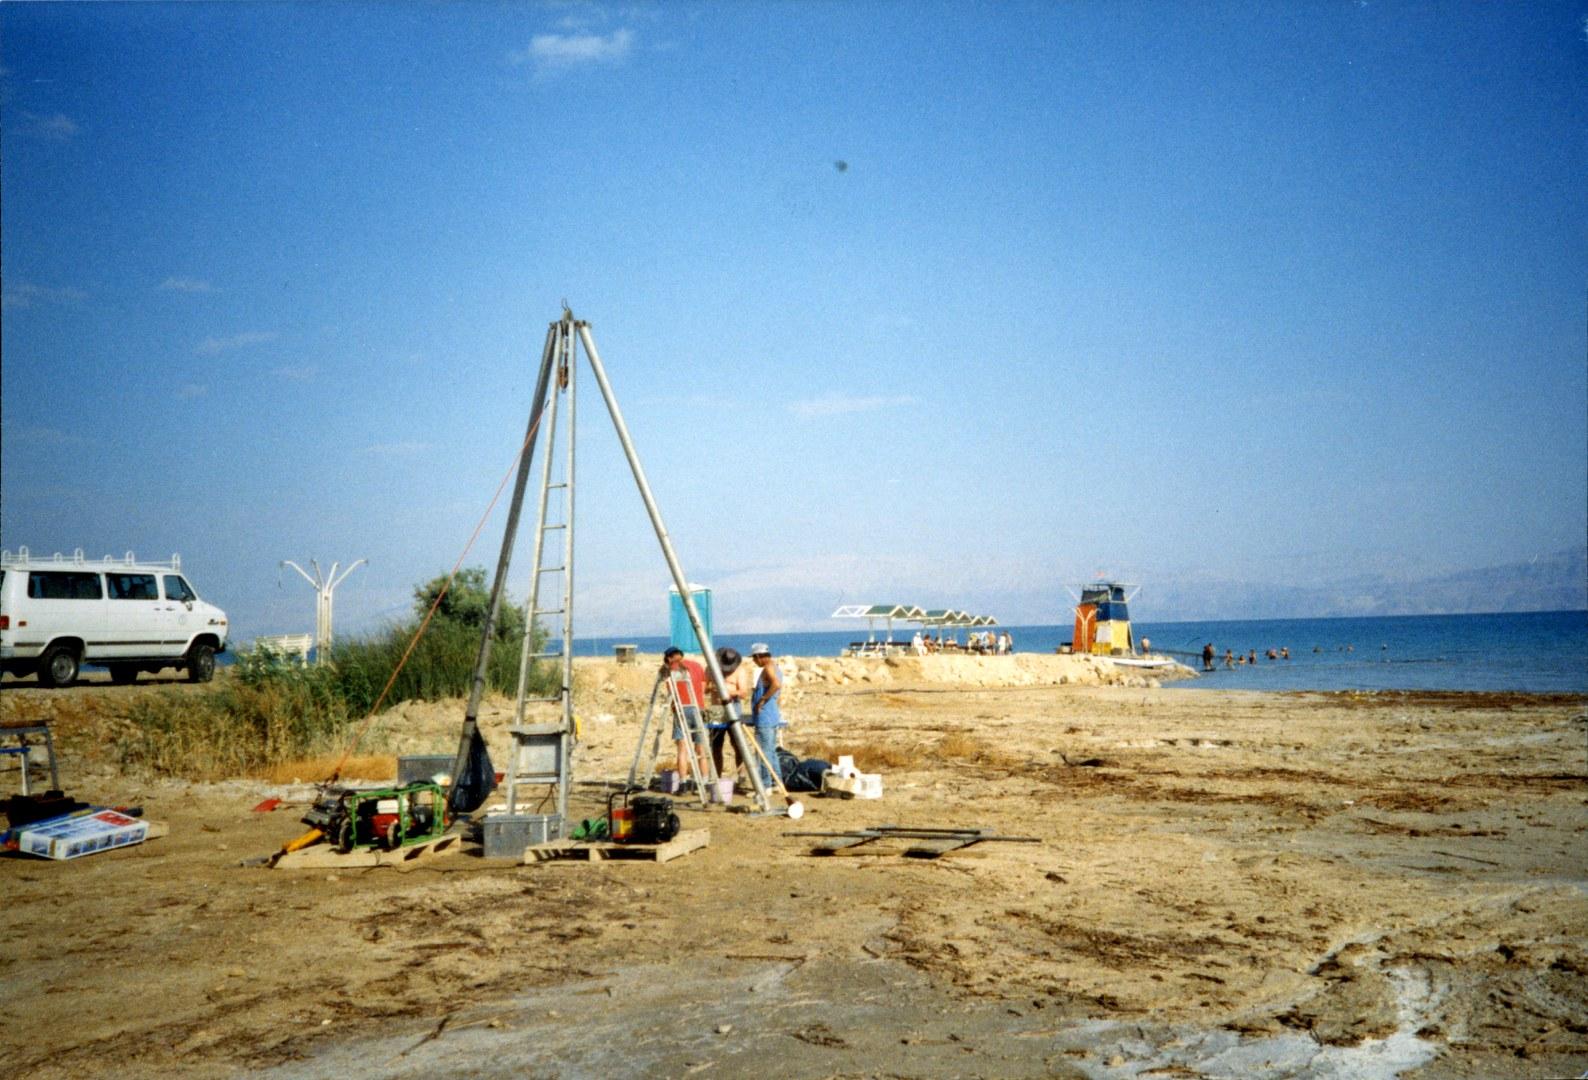 Bohrung am Westufer des Toten Meers: